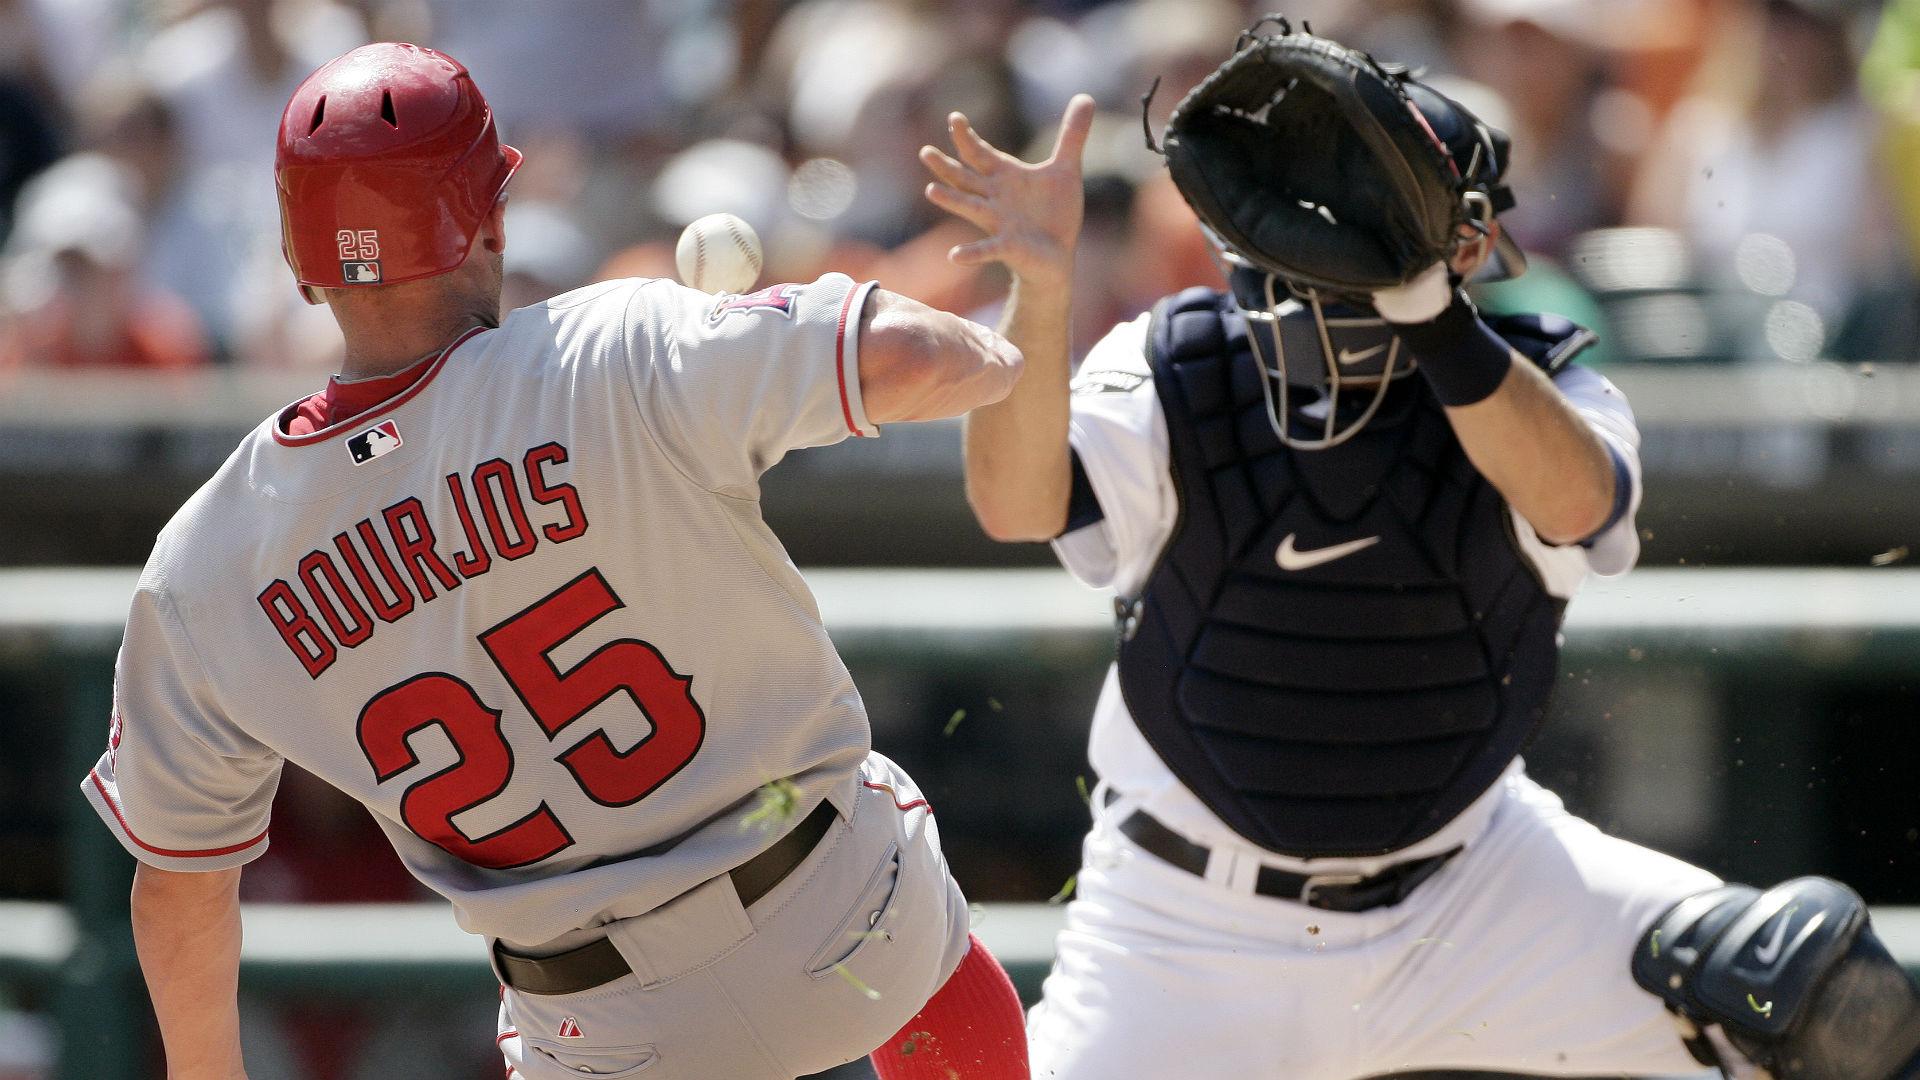 Fantasy Baseball quick hits: Bourjos-Freese trade